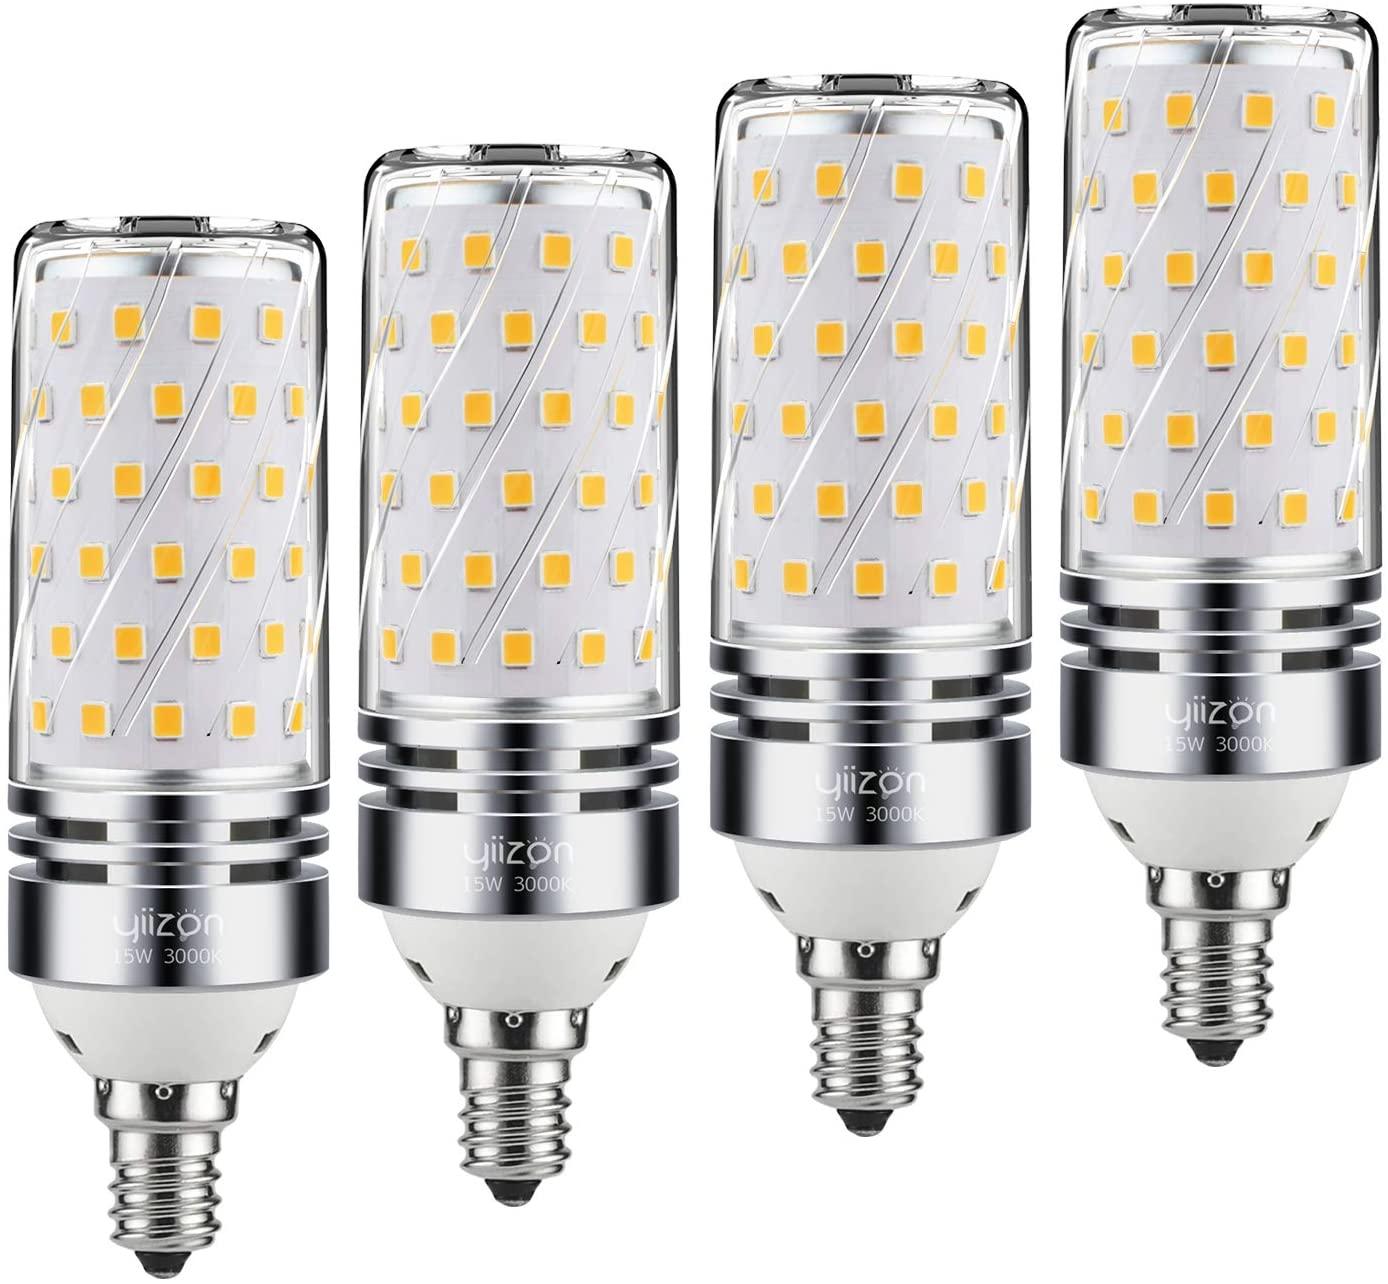 Yiizon E12 LED Corn Bulbs,15W LED Candelabra Light Bulbs 120 Watt Equivalent, 1500lm, Warm White 3000K LED Chandelier Bulbs, Decorative Candle, Non-Dimmable LED Lamp(4-Pack)